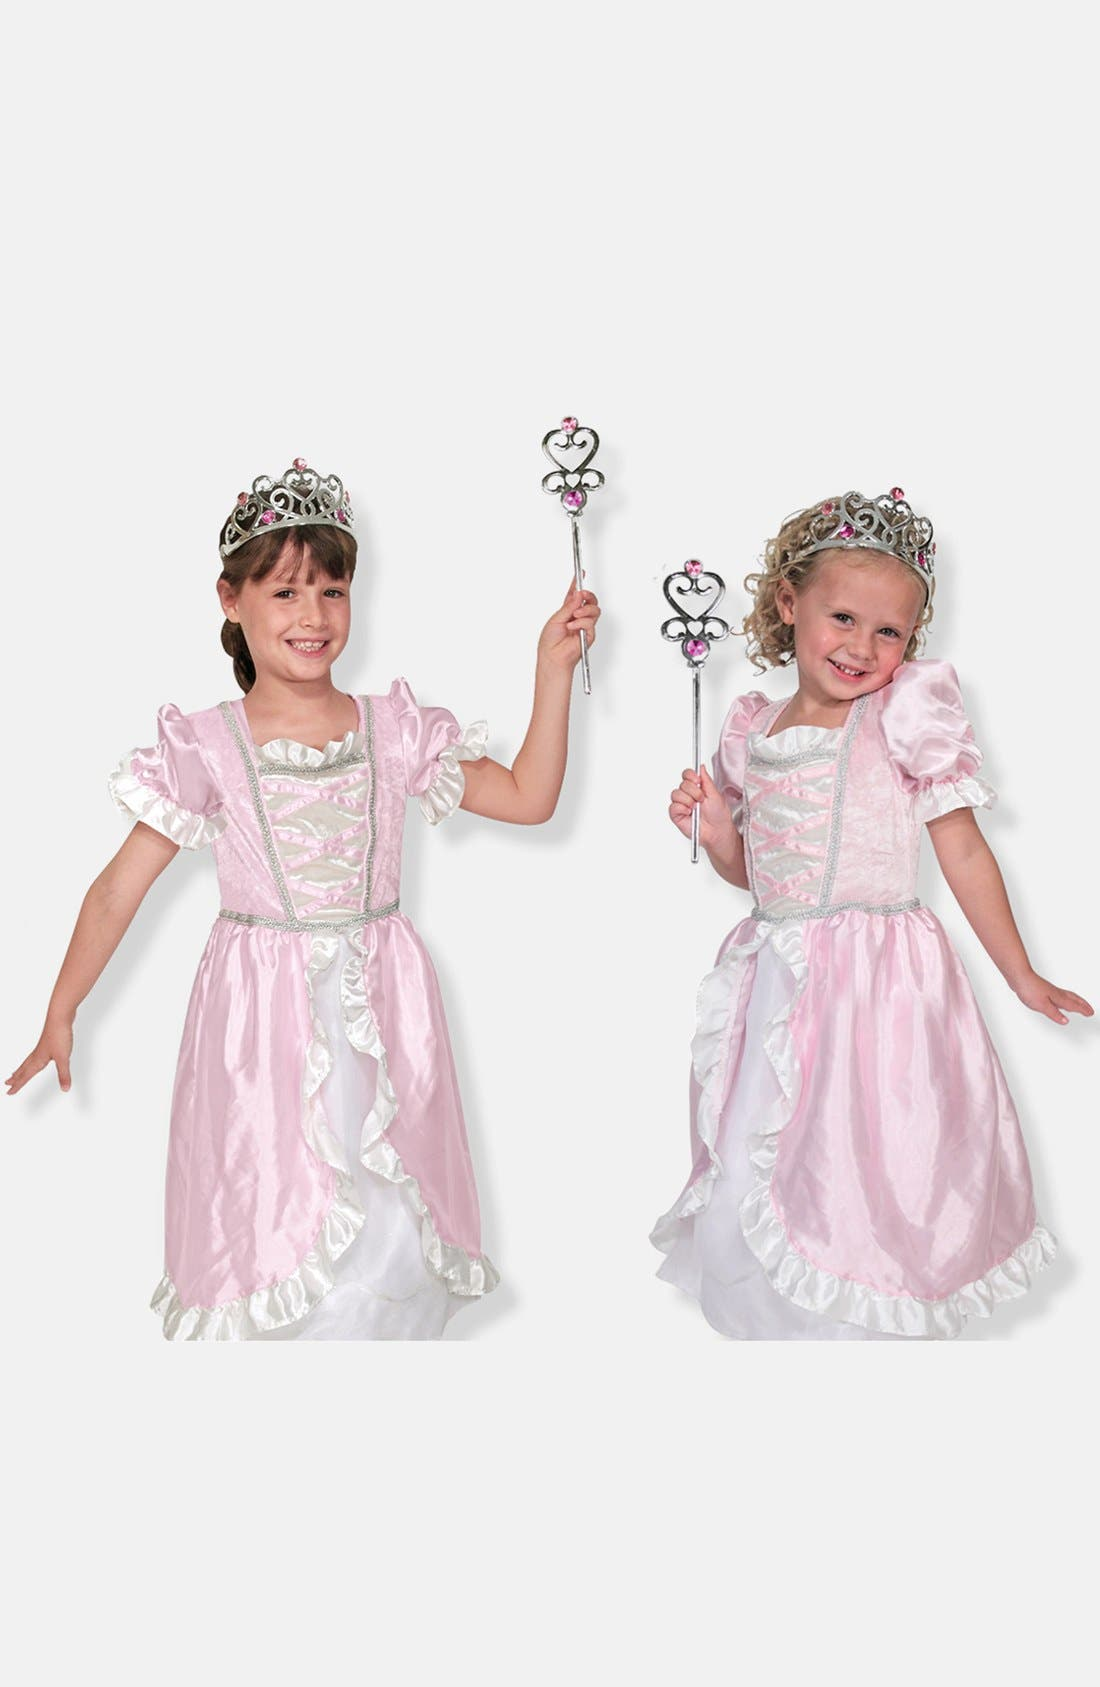 MELISSA & DOUG Personalized Princess Costume